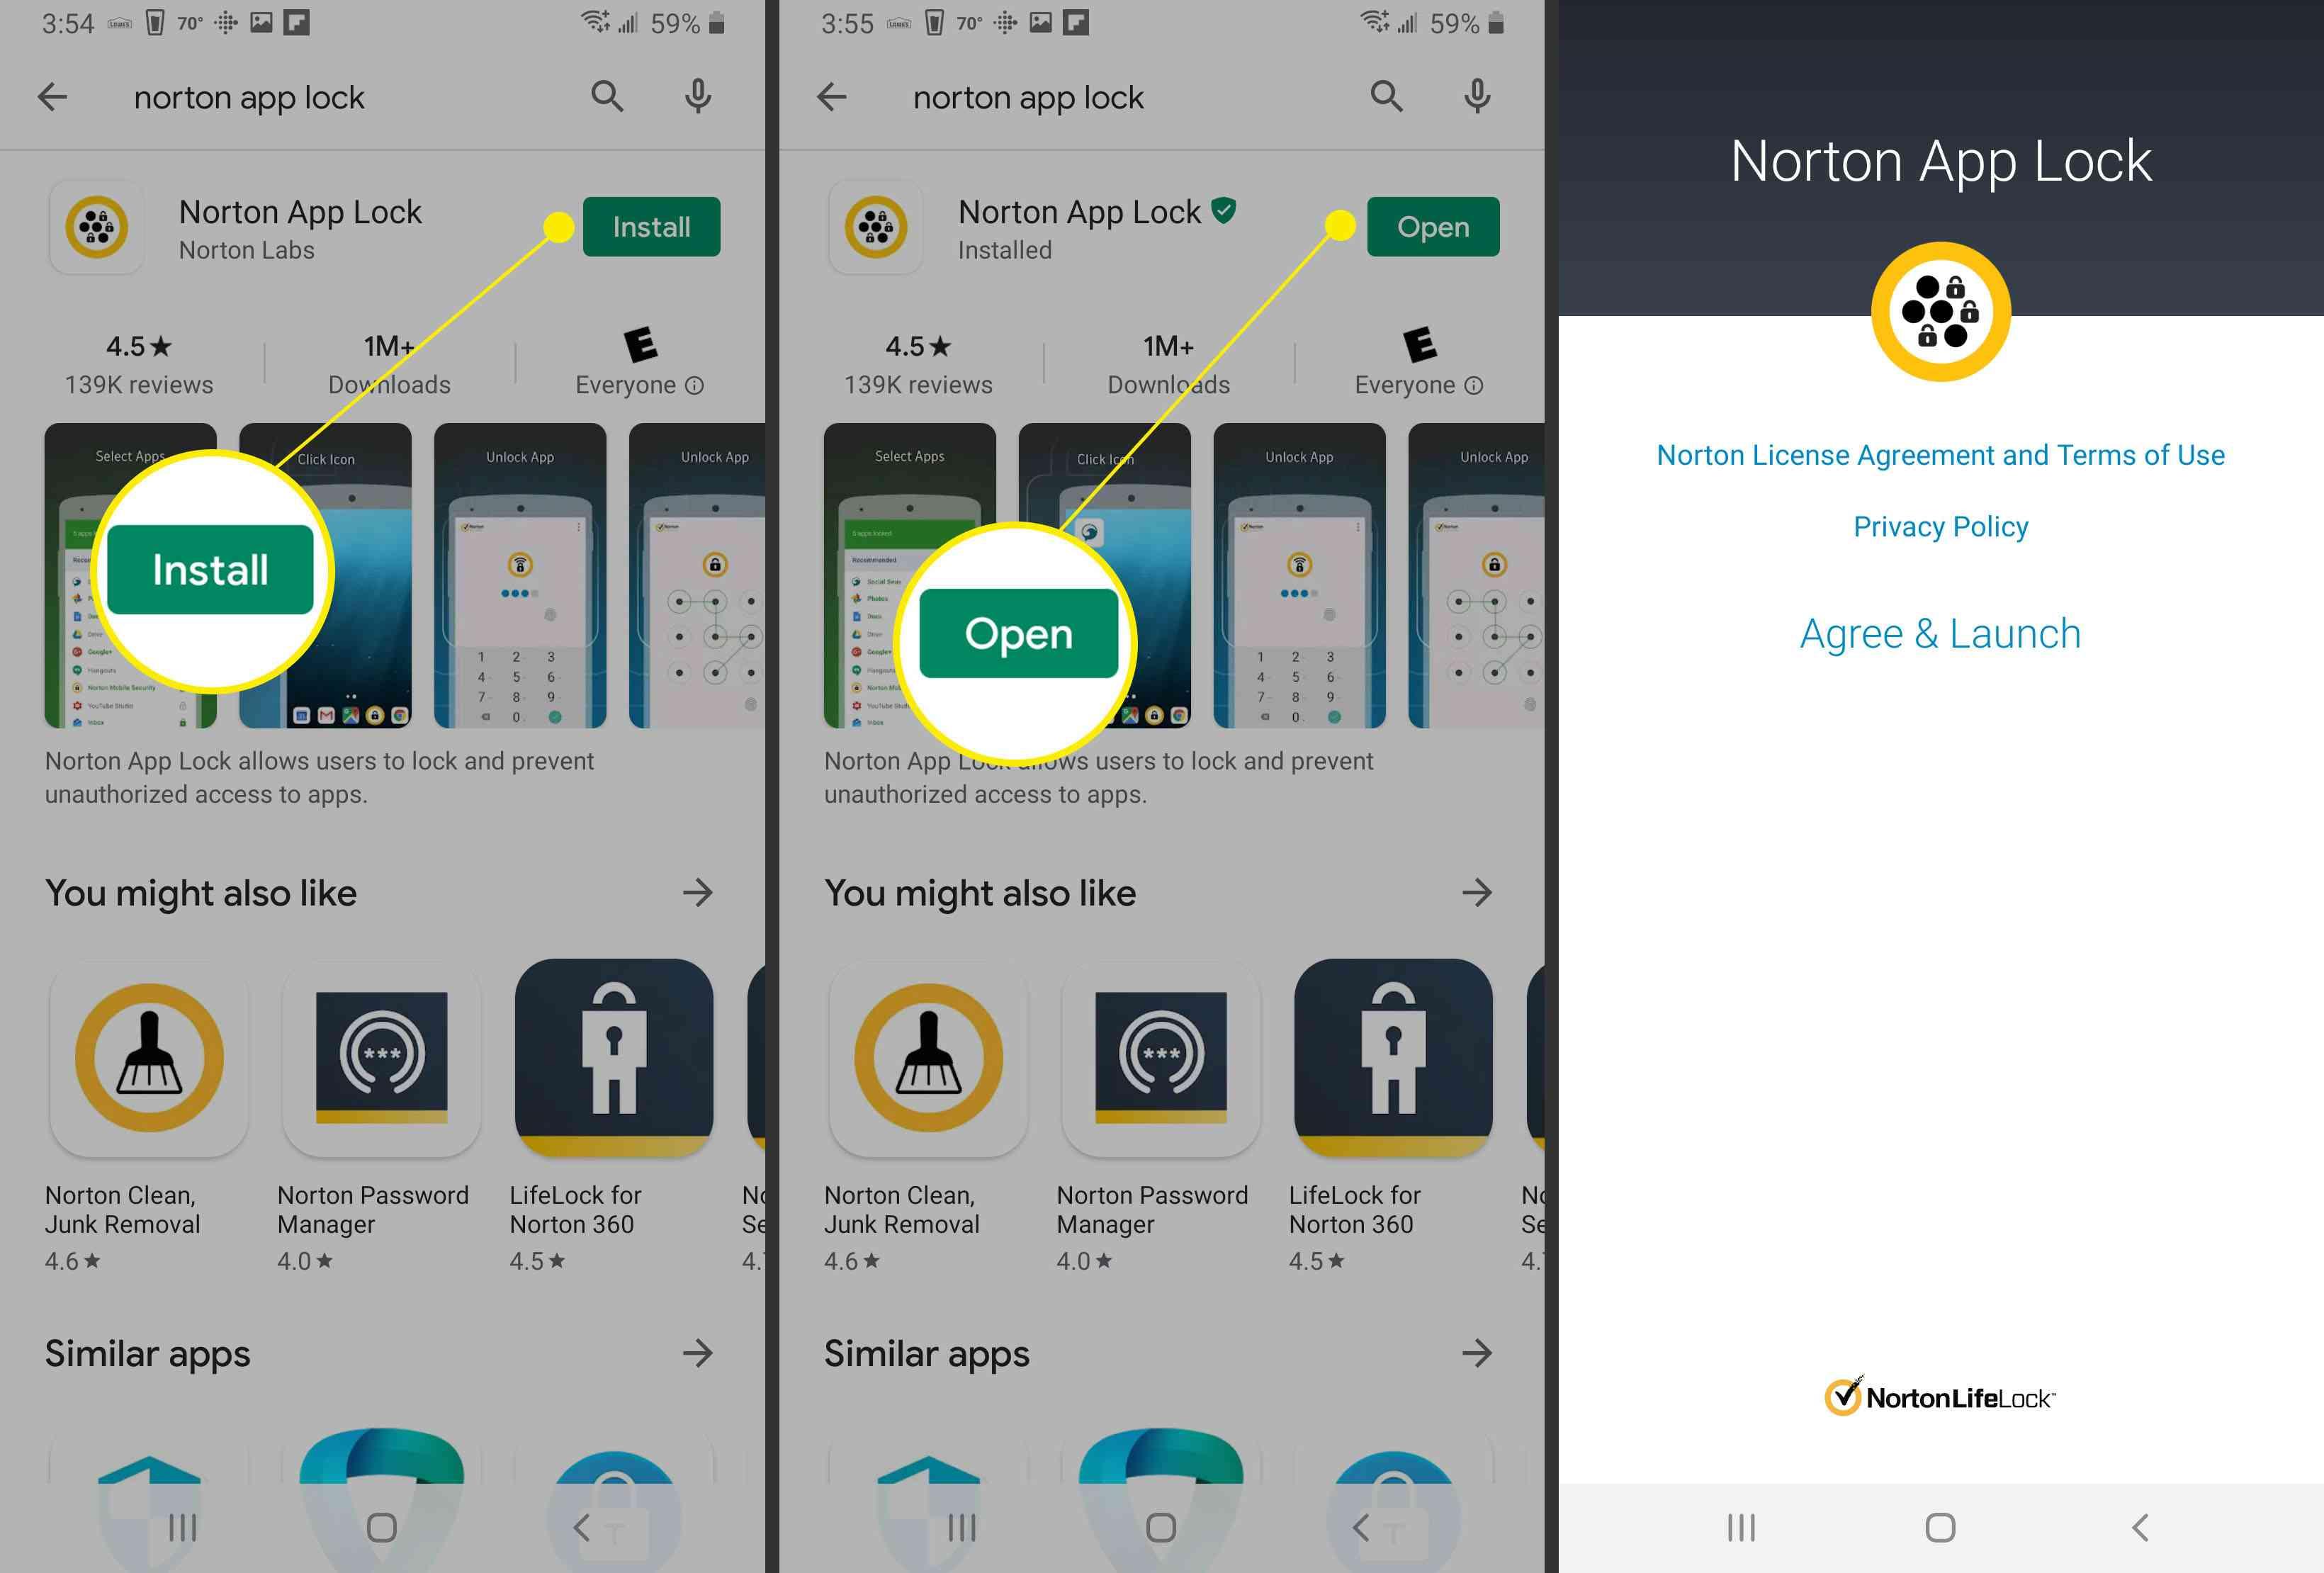 Installing and opening Norton App Lock.